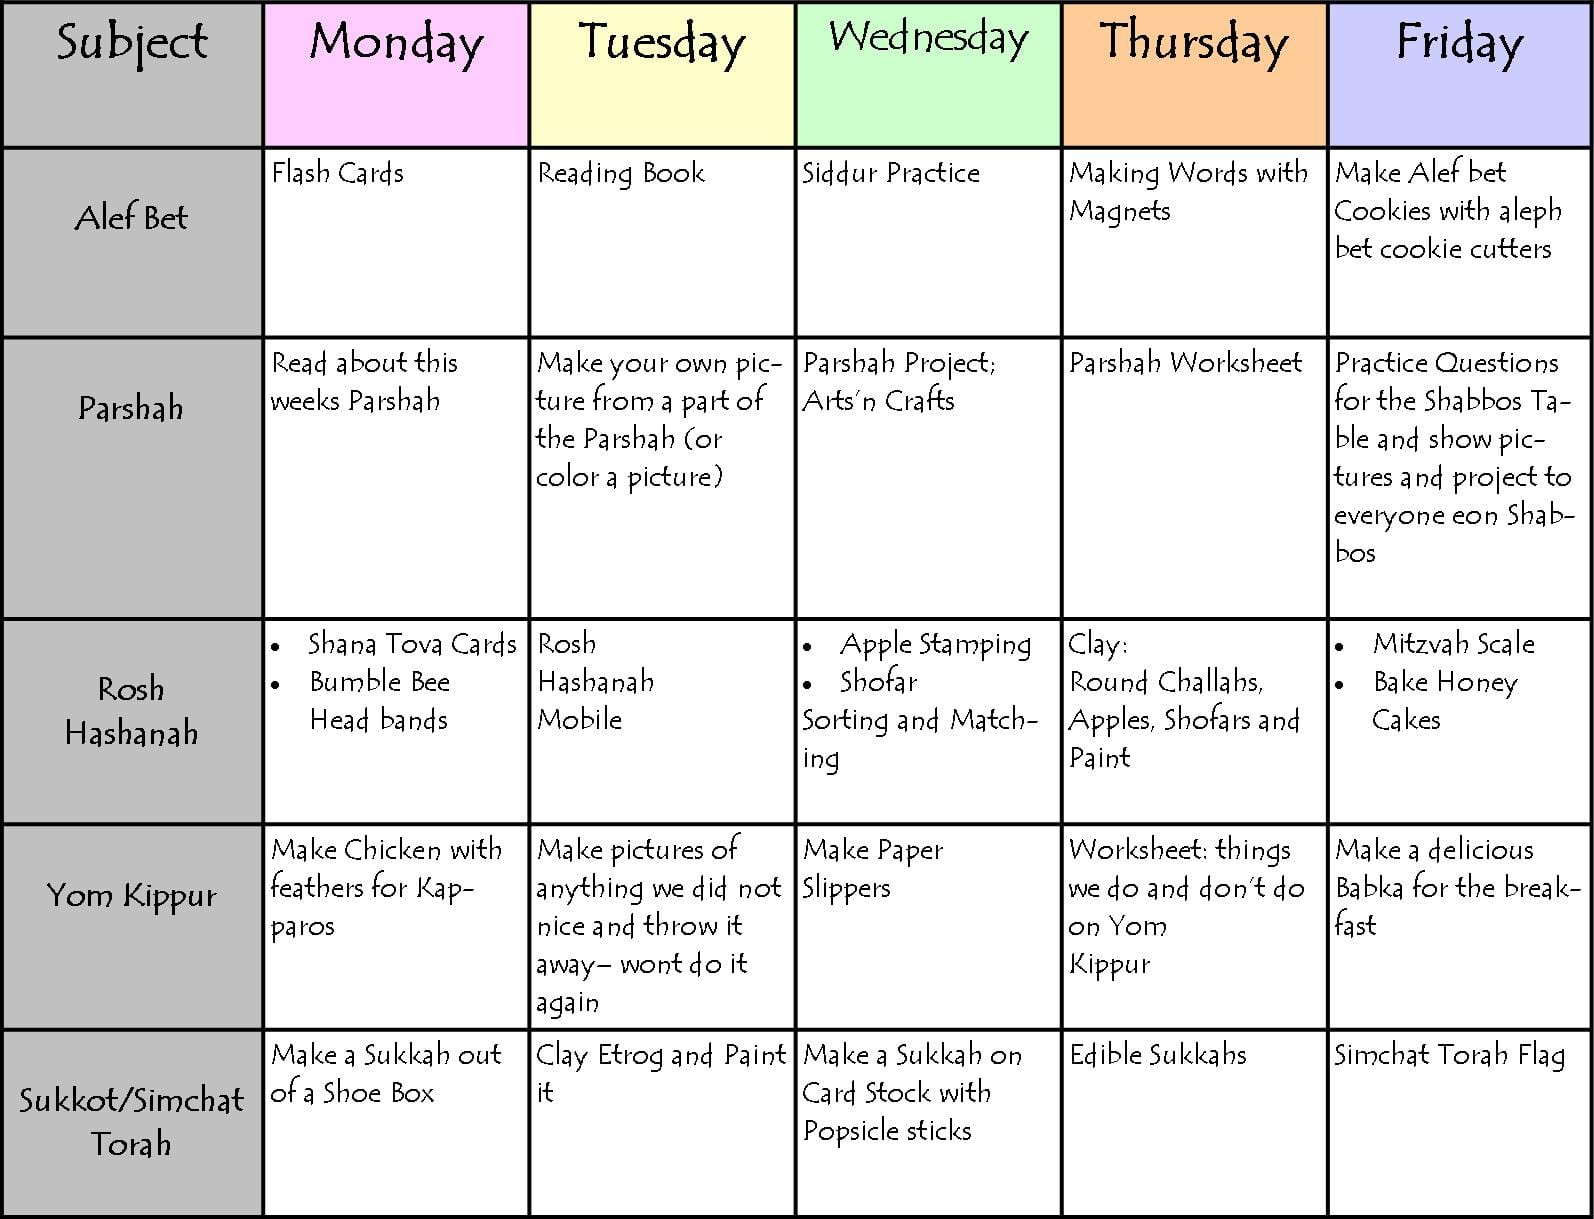 Schedule Spreadsheet Template